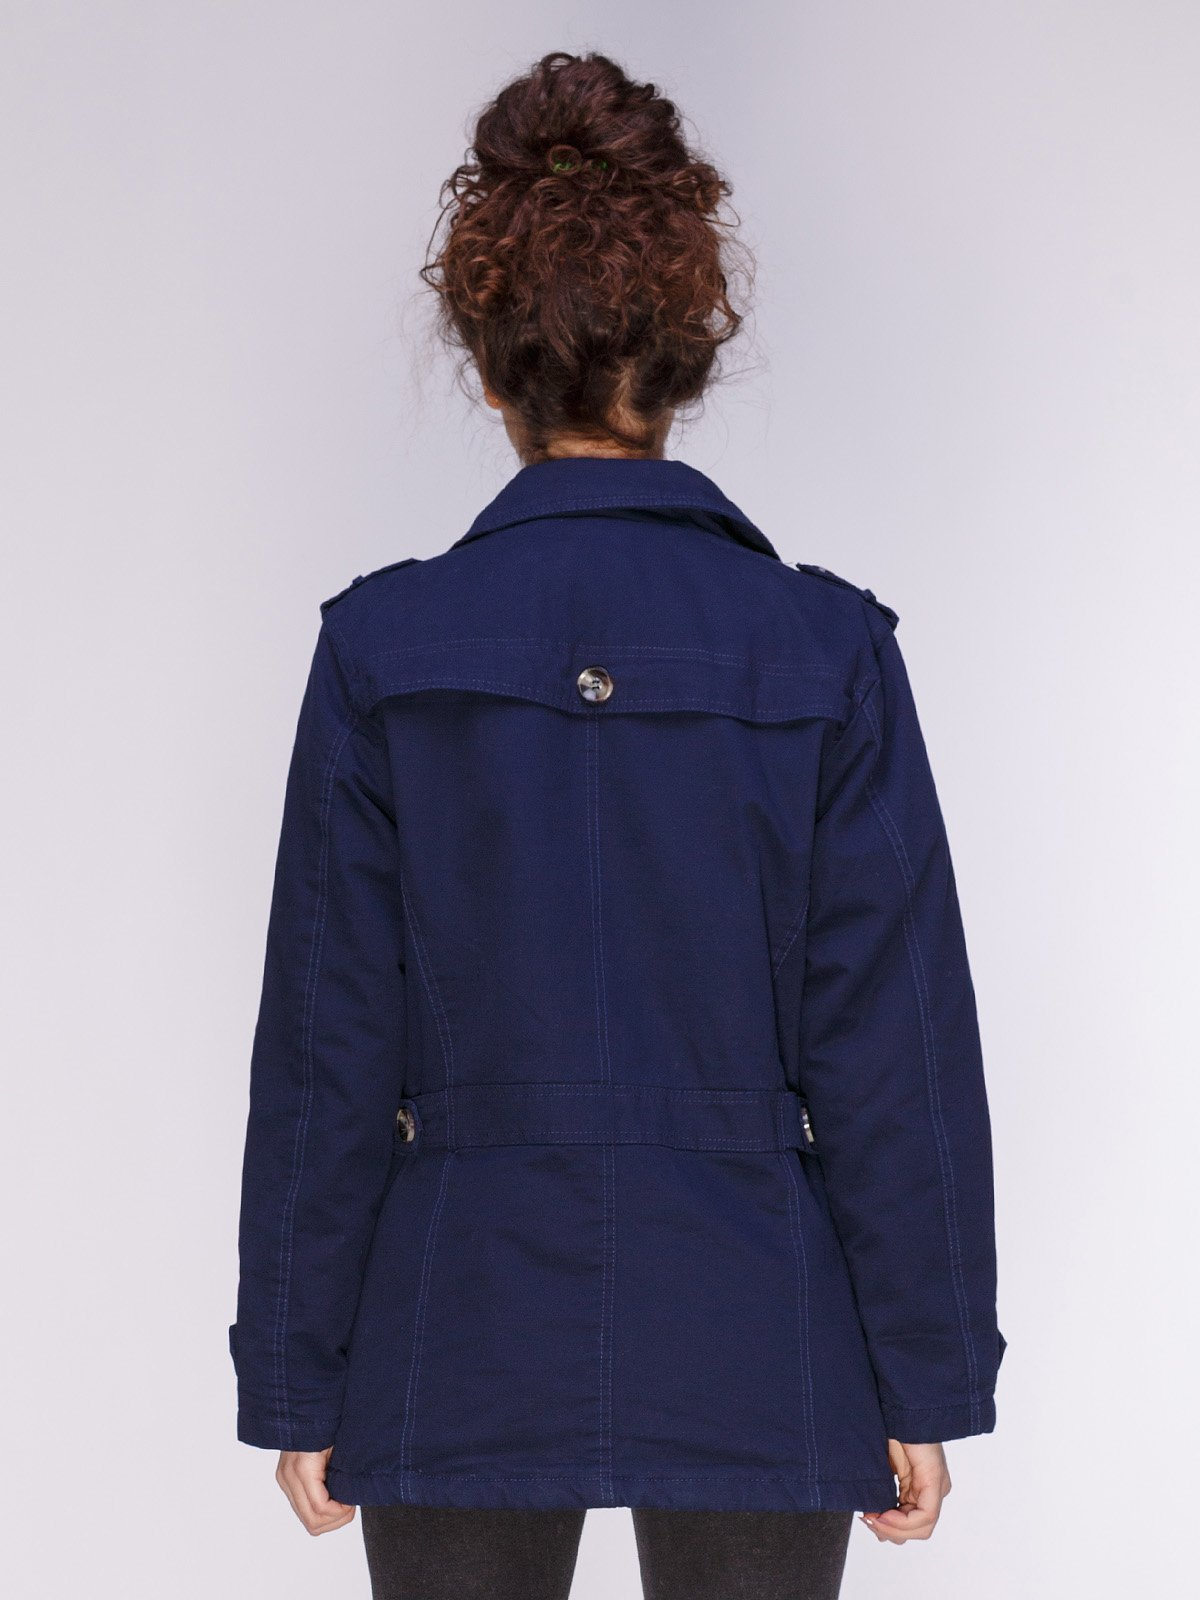 Куртка темно-синяя   3666661   фото 2